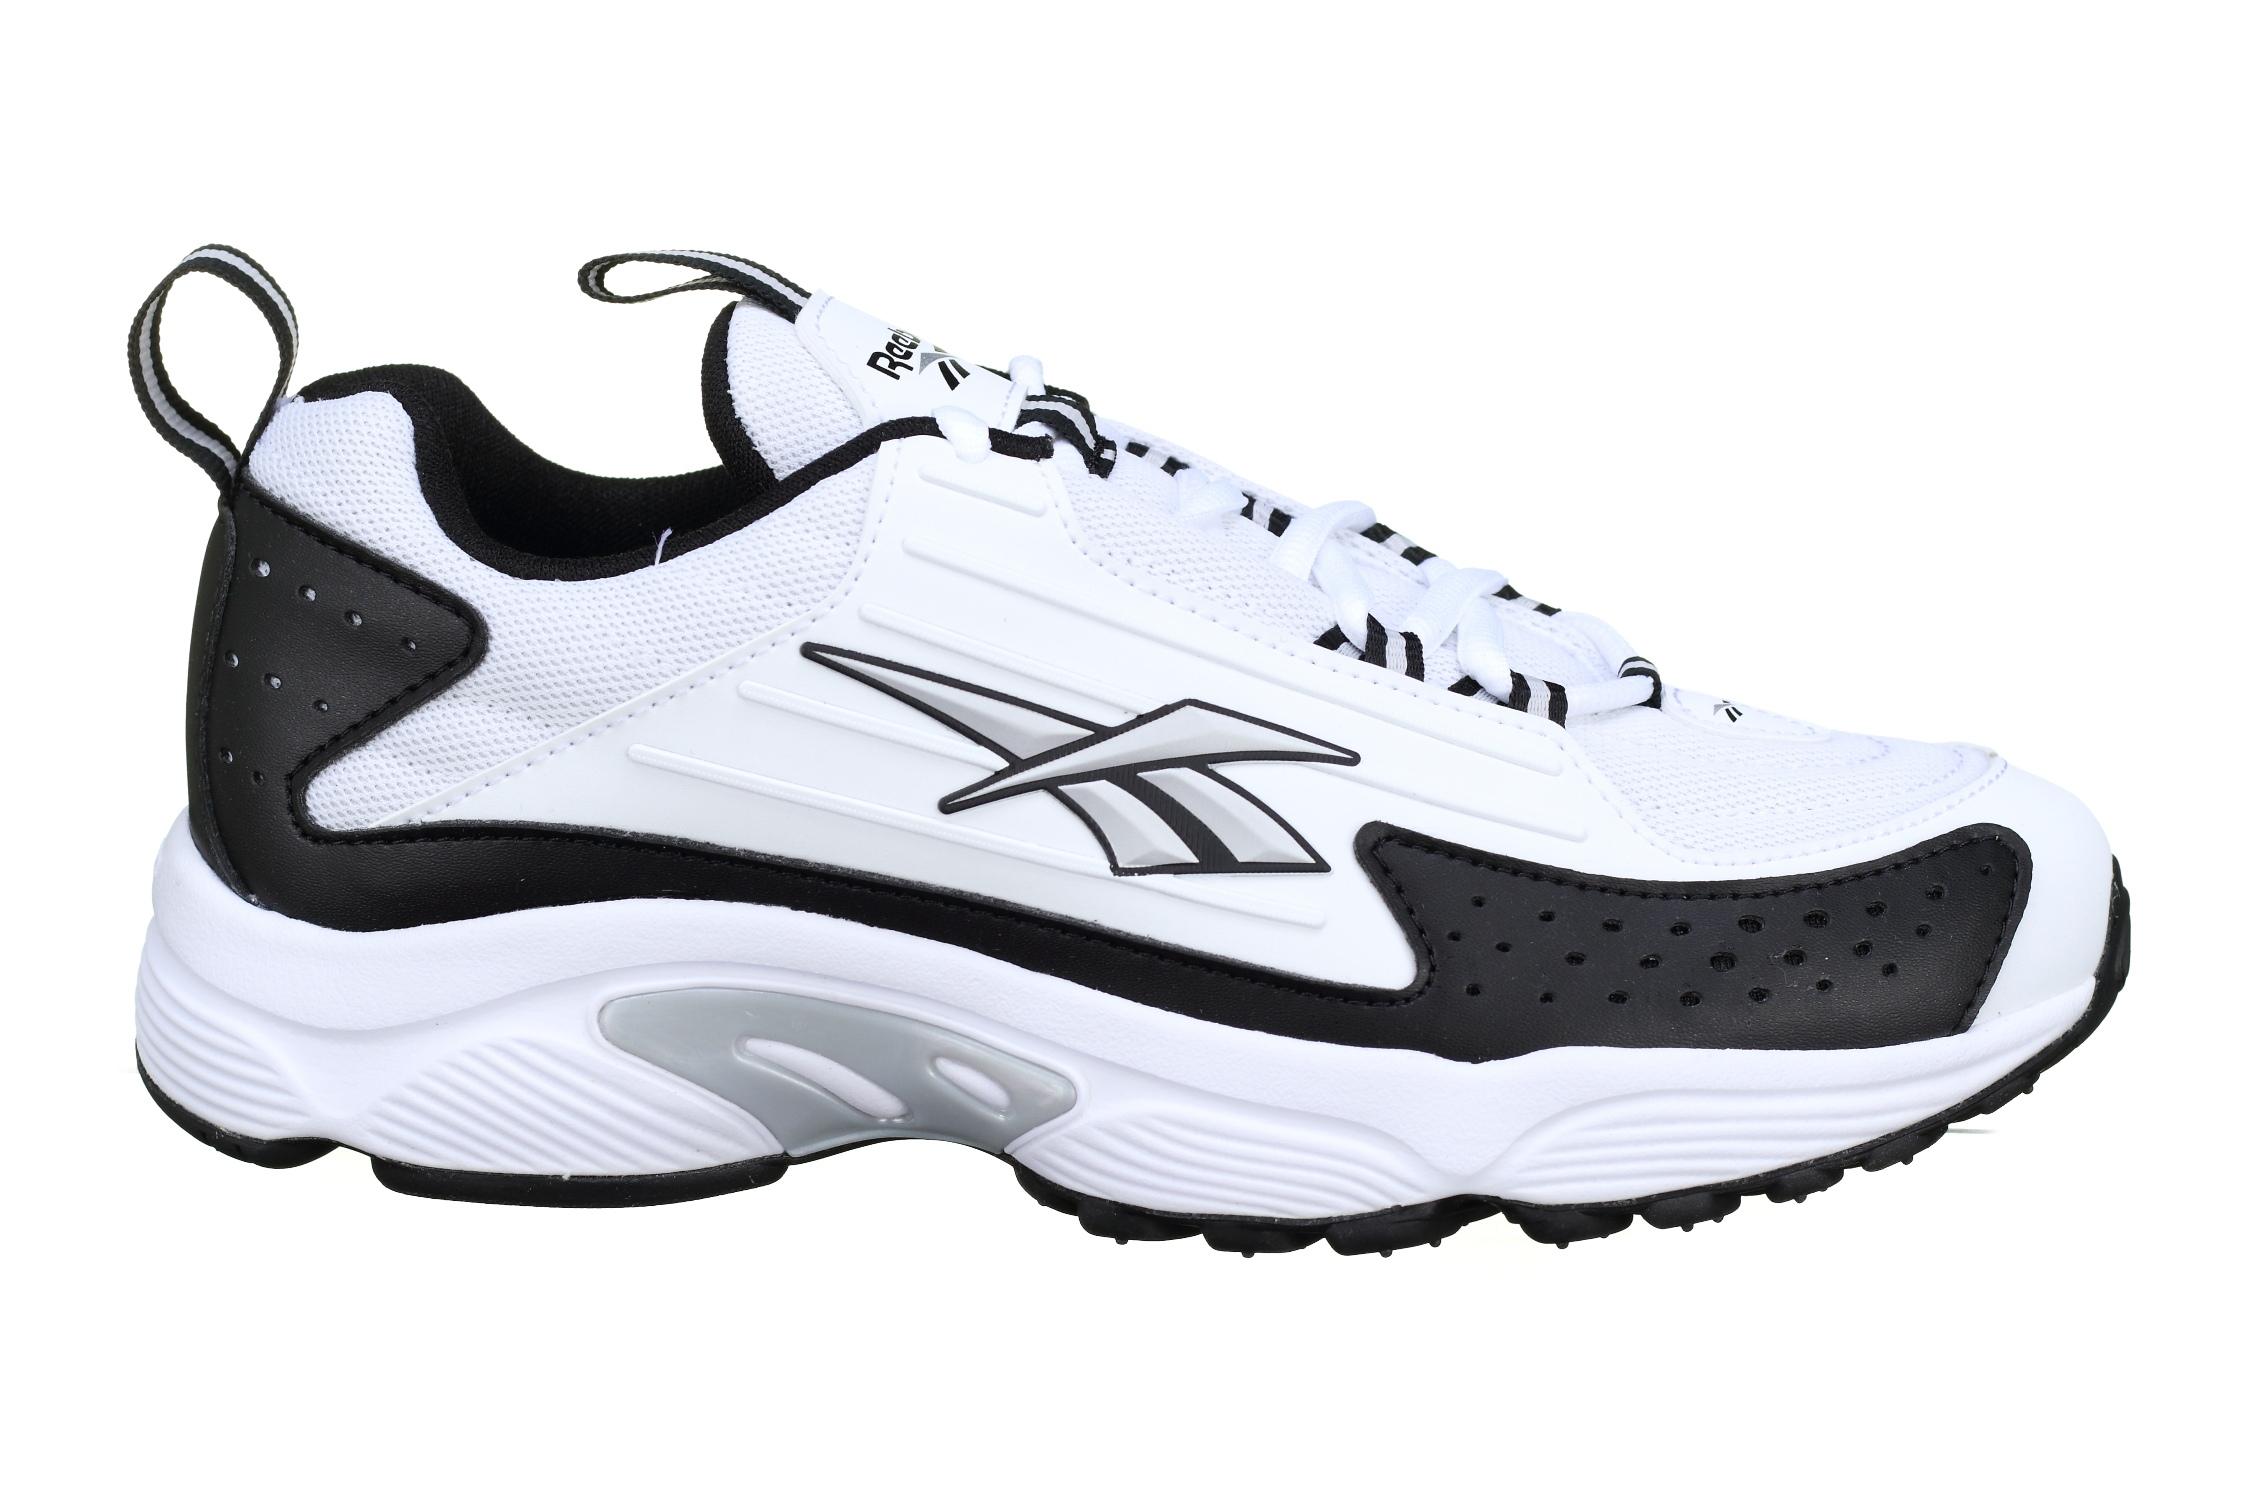 https://www.leadermode.com/180892/adidas-dmx-series-2200-dv8491-blanc.jpg